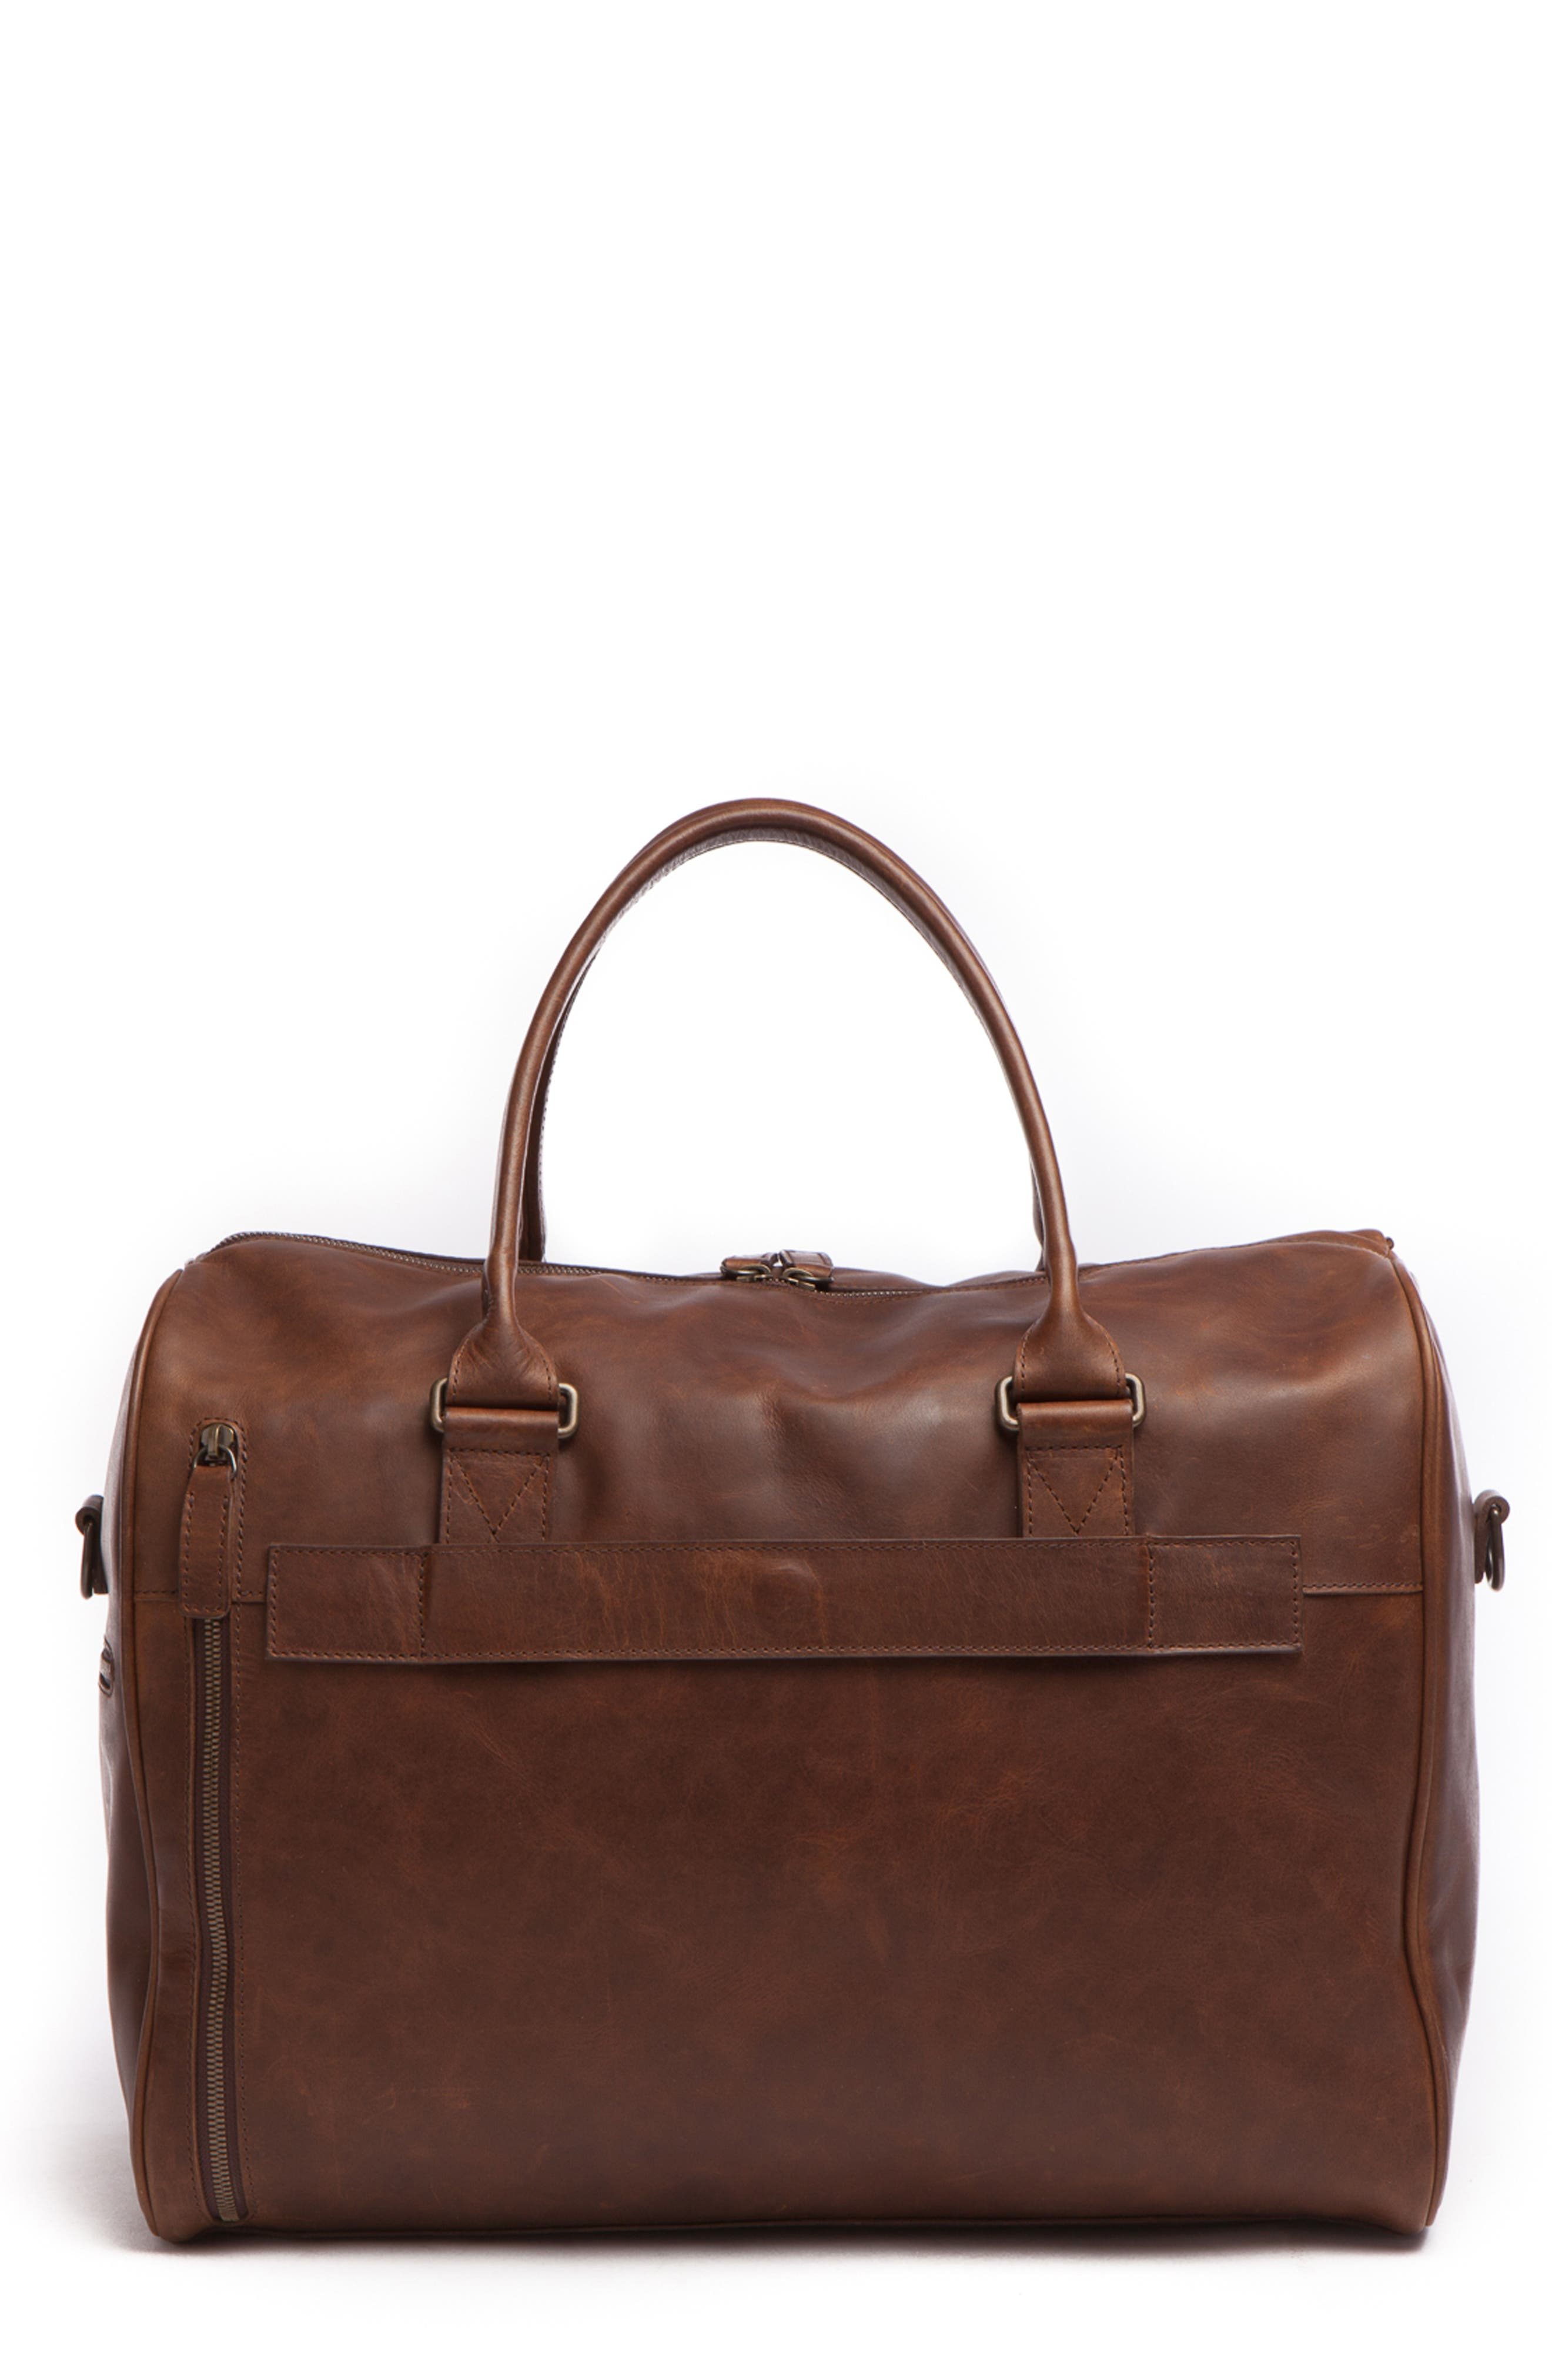 Booker Leather Duffel Bag,                             Main thumbnail 1, color,                             BALDWIN OAK